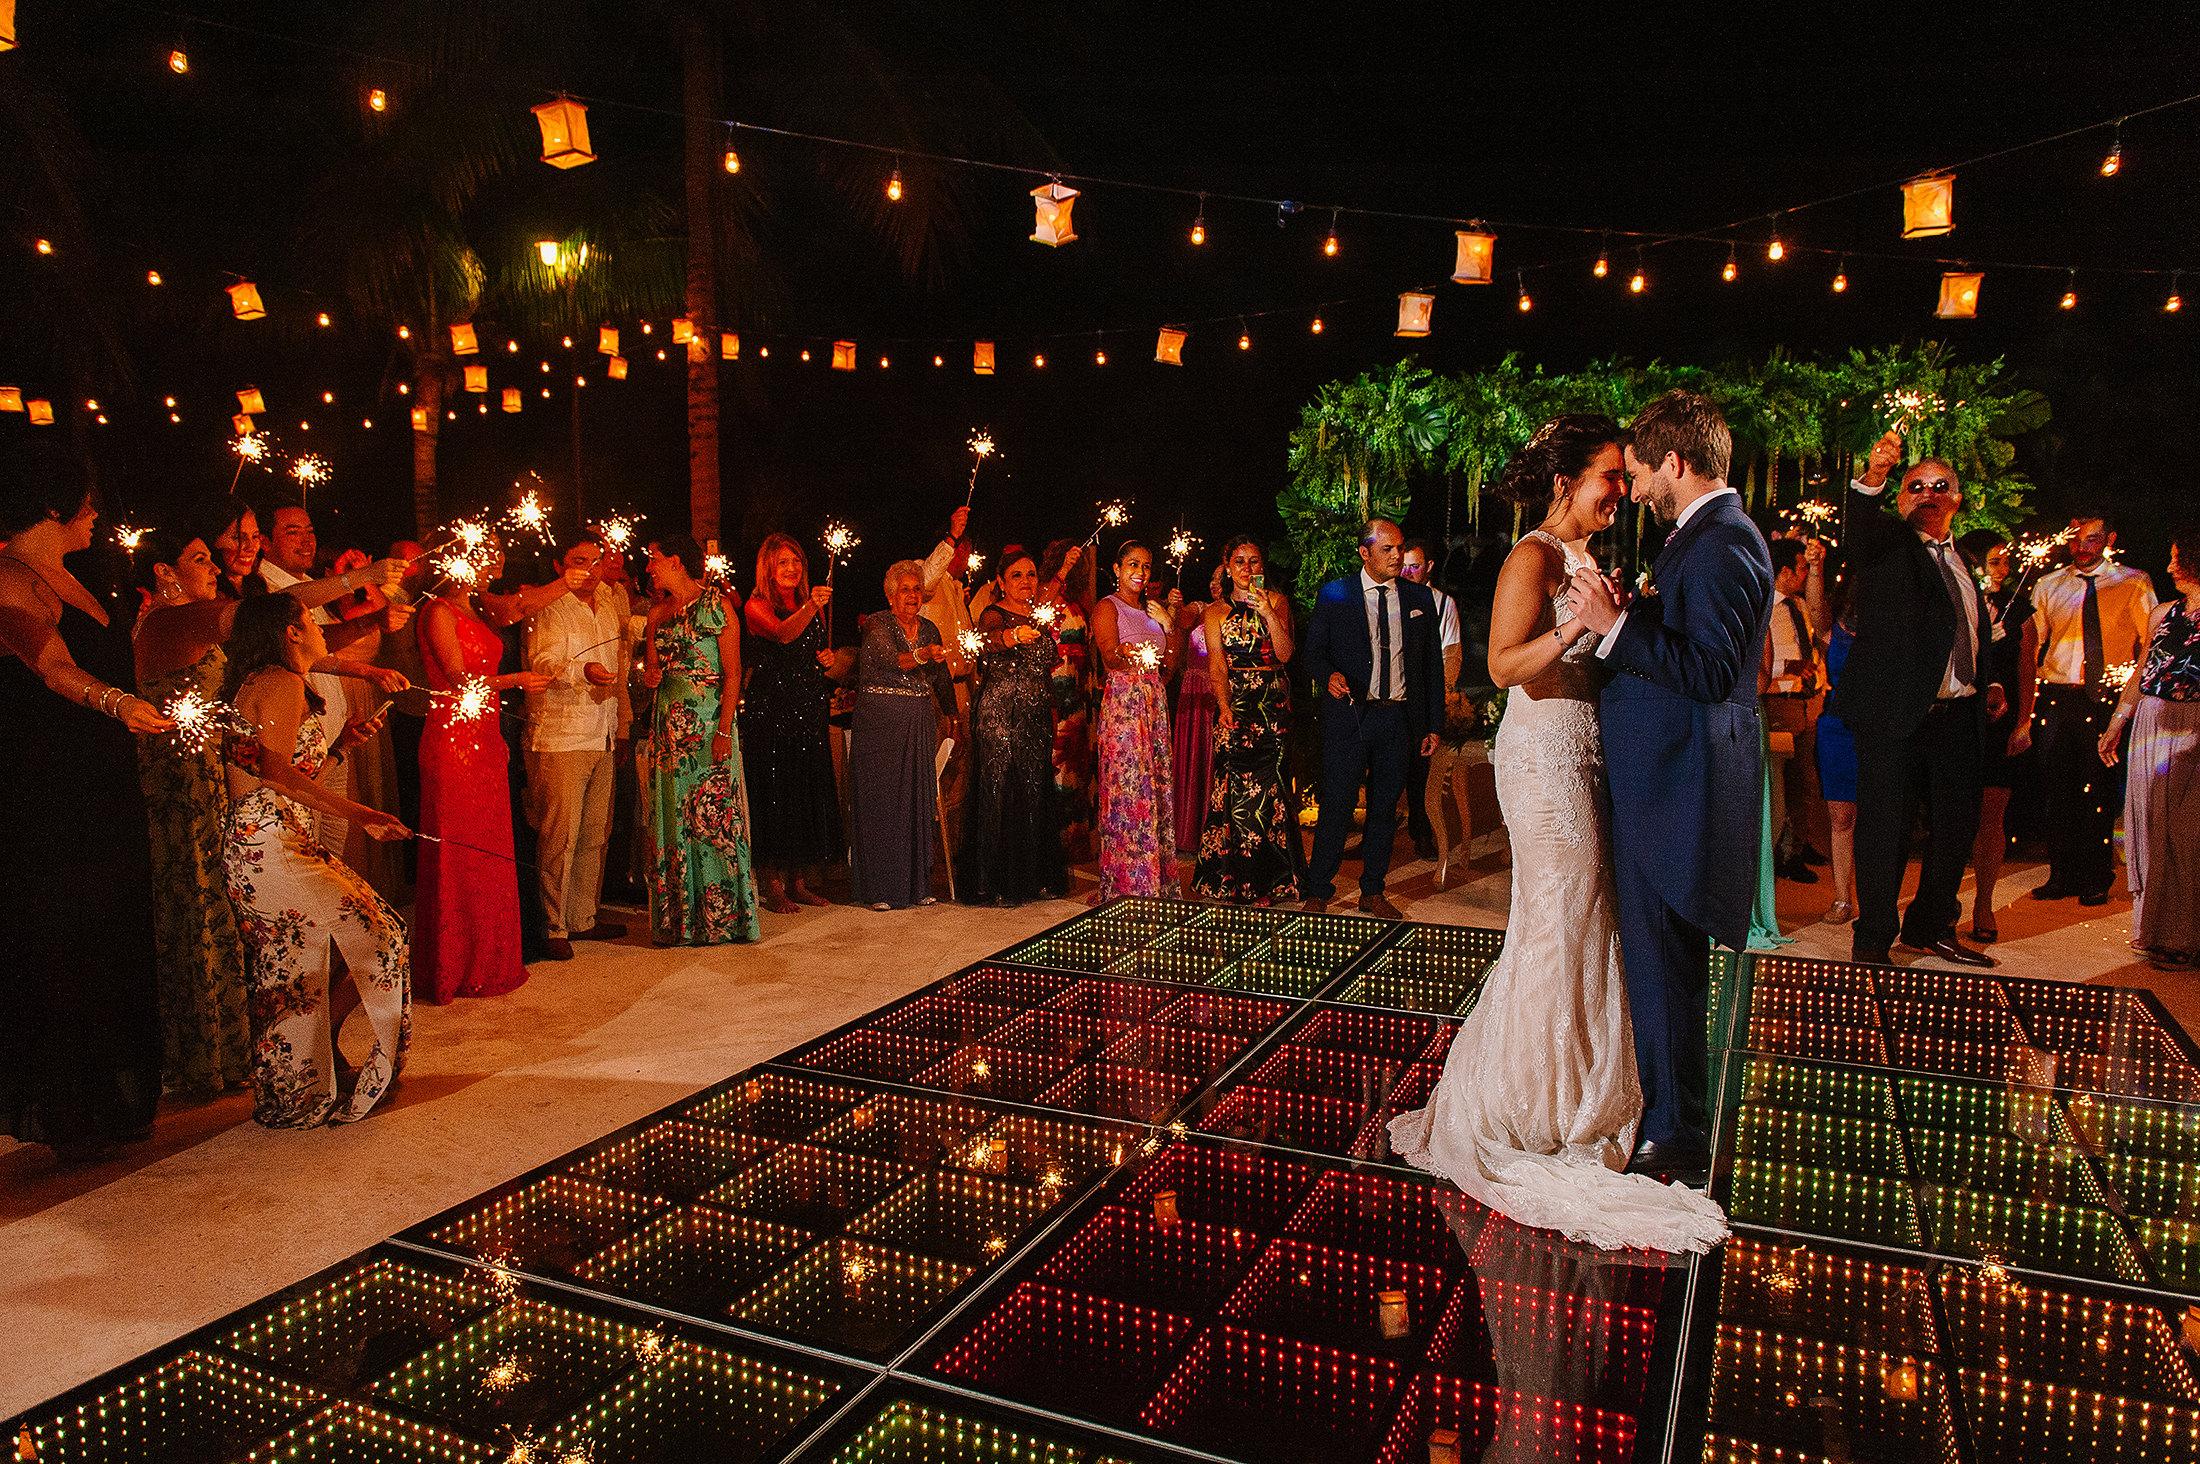 Frist dance string of lightbulbs beautiful decoration in Riviera maya